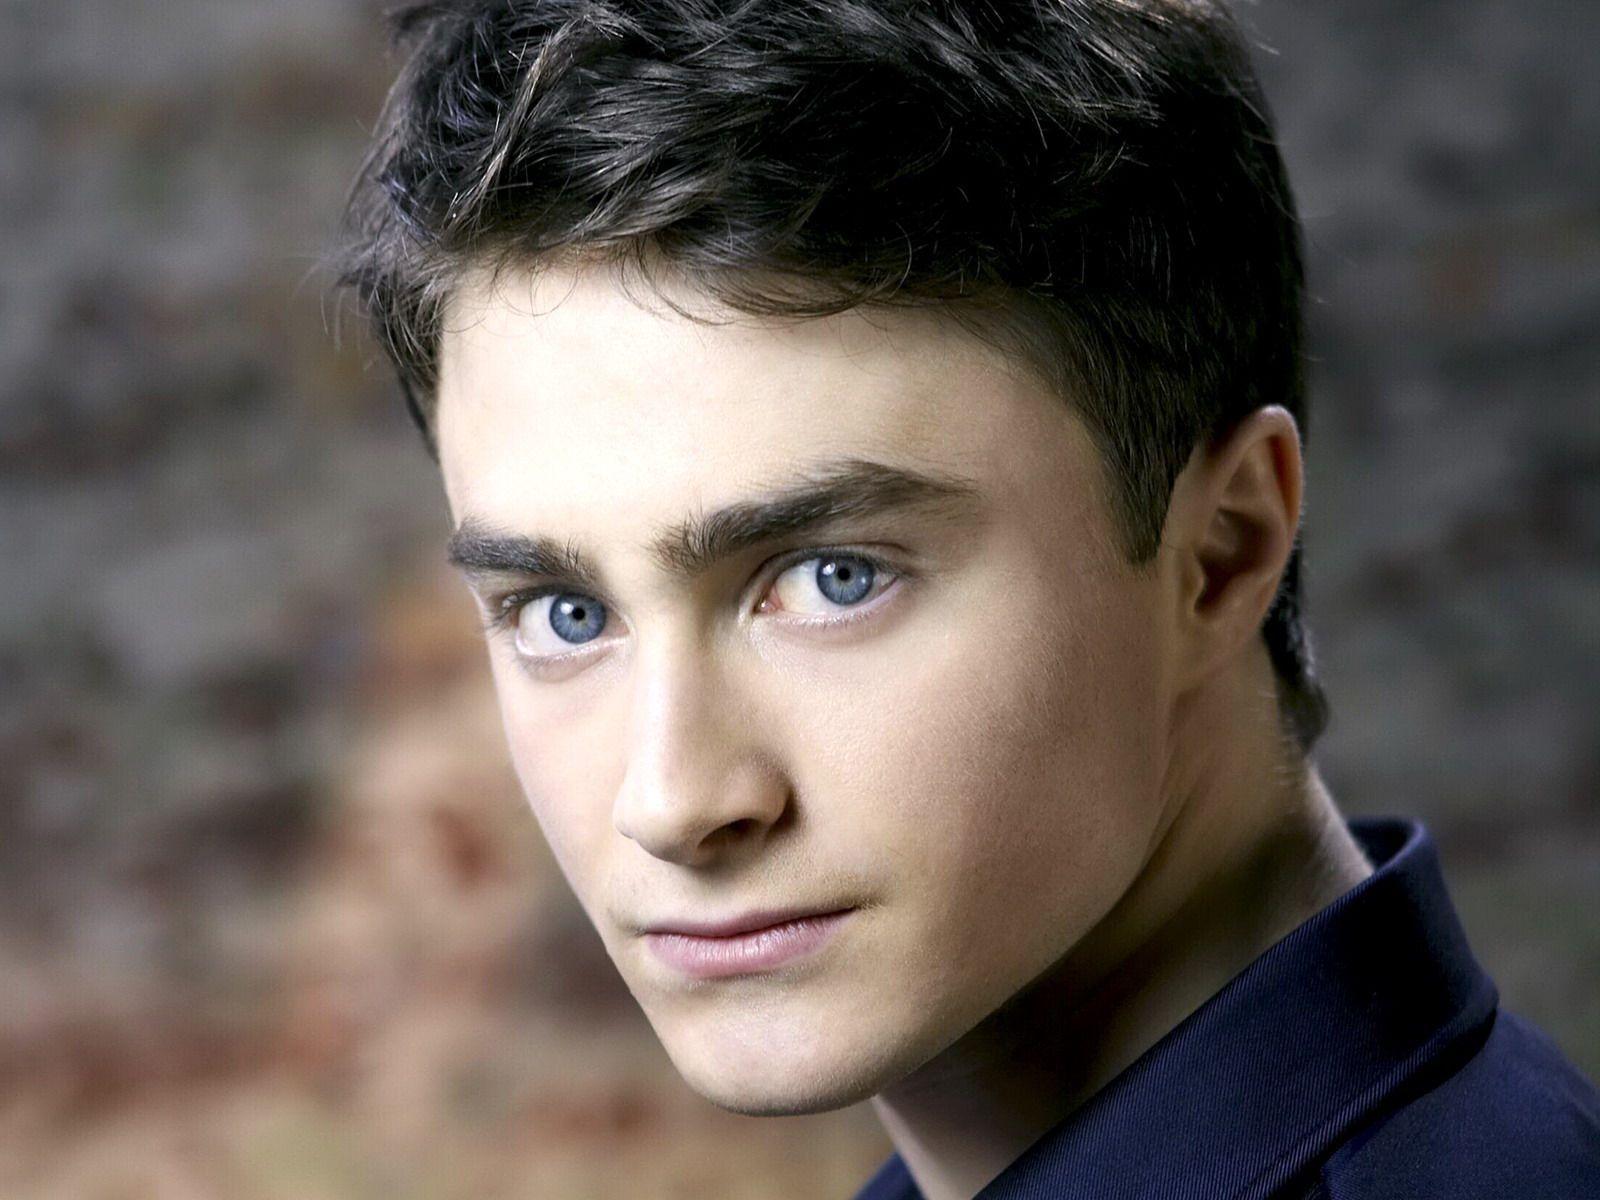 Image result for Daniel radcliffe gay face